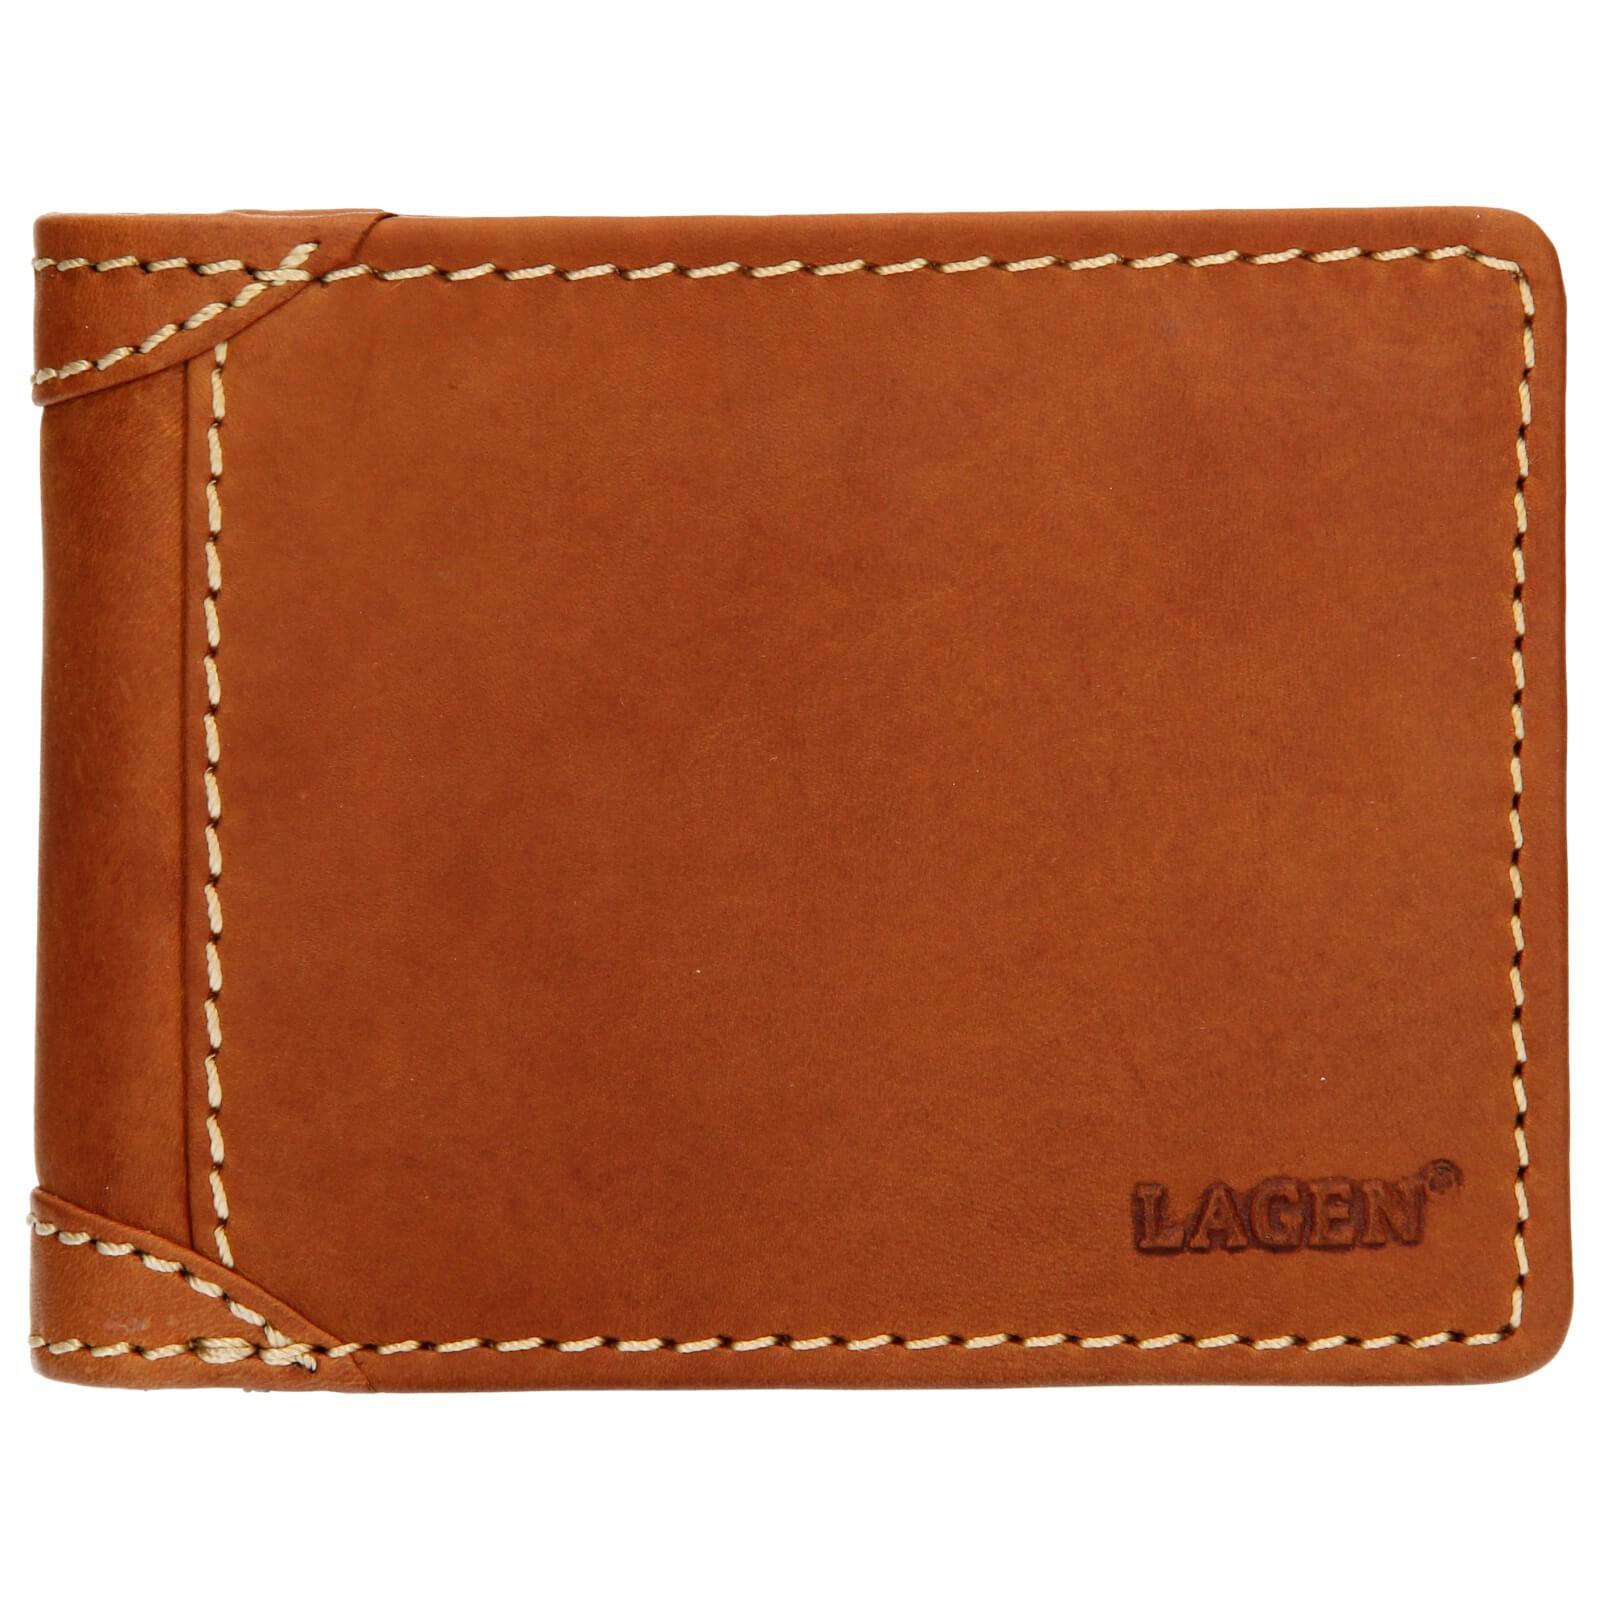 Pánska kožená peňaženka Lagen Peter - koňak